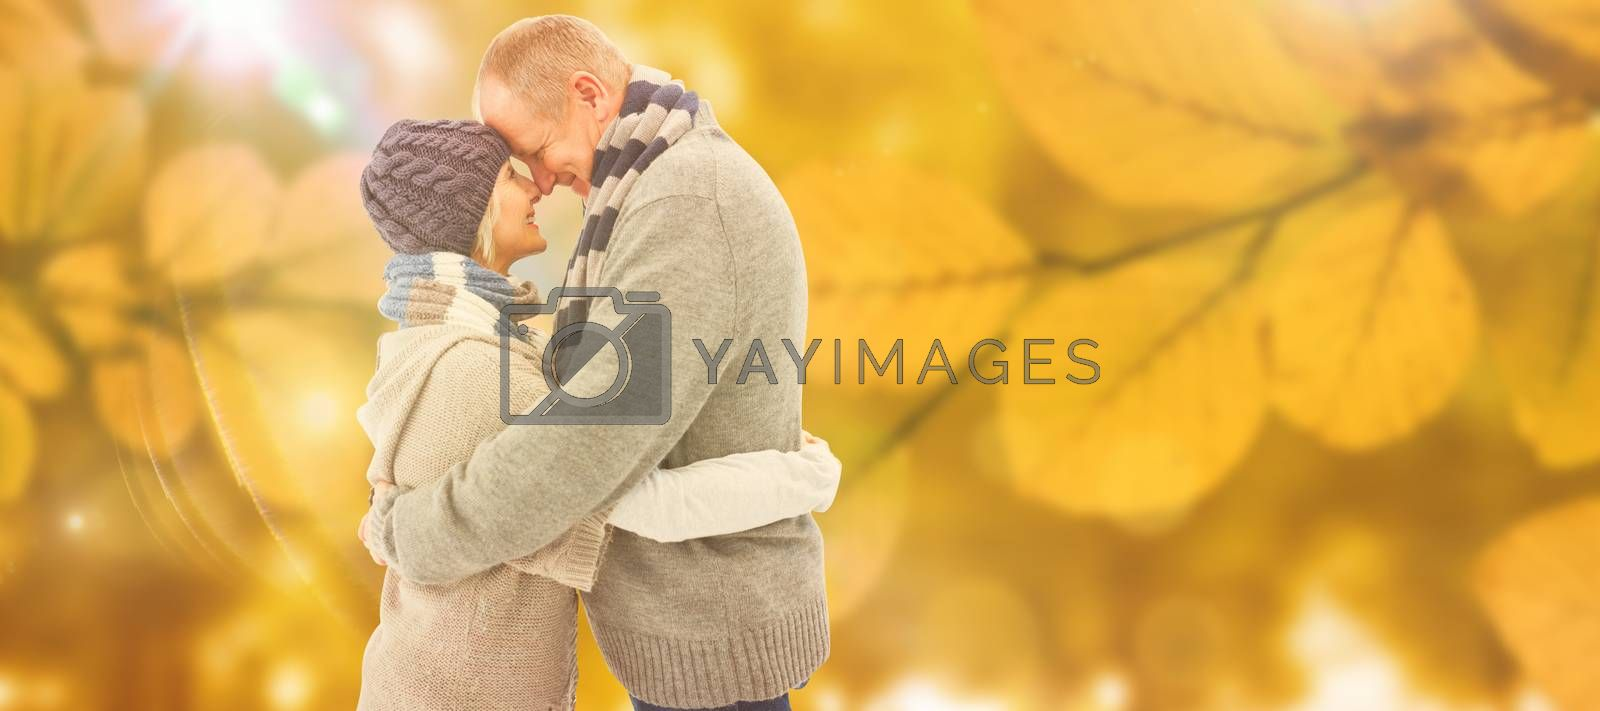 Happy mature couple in winter clothes hugging against autumn scene